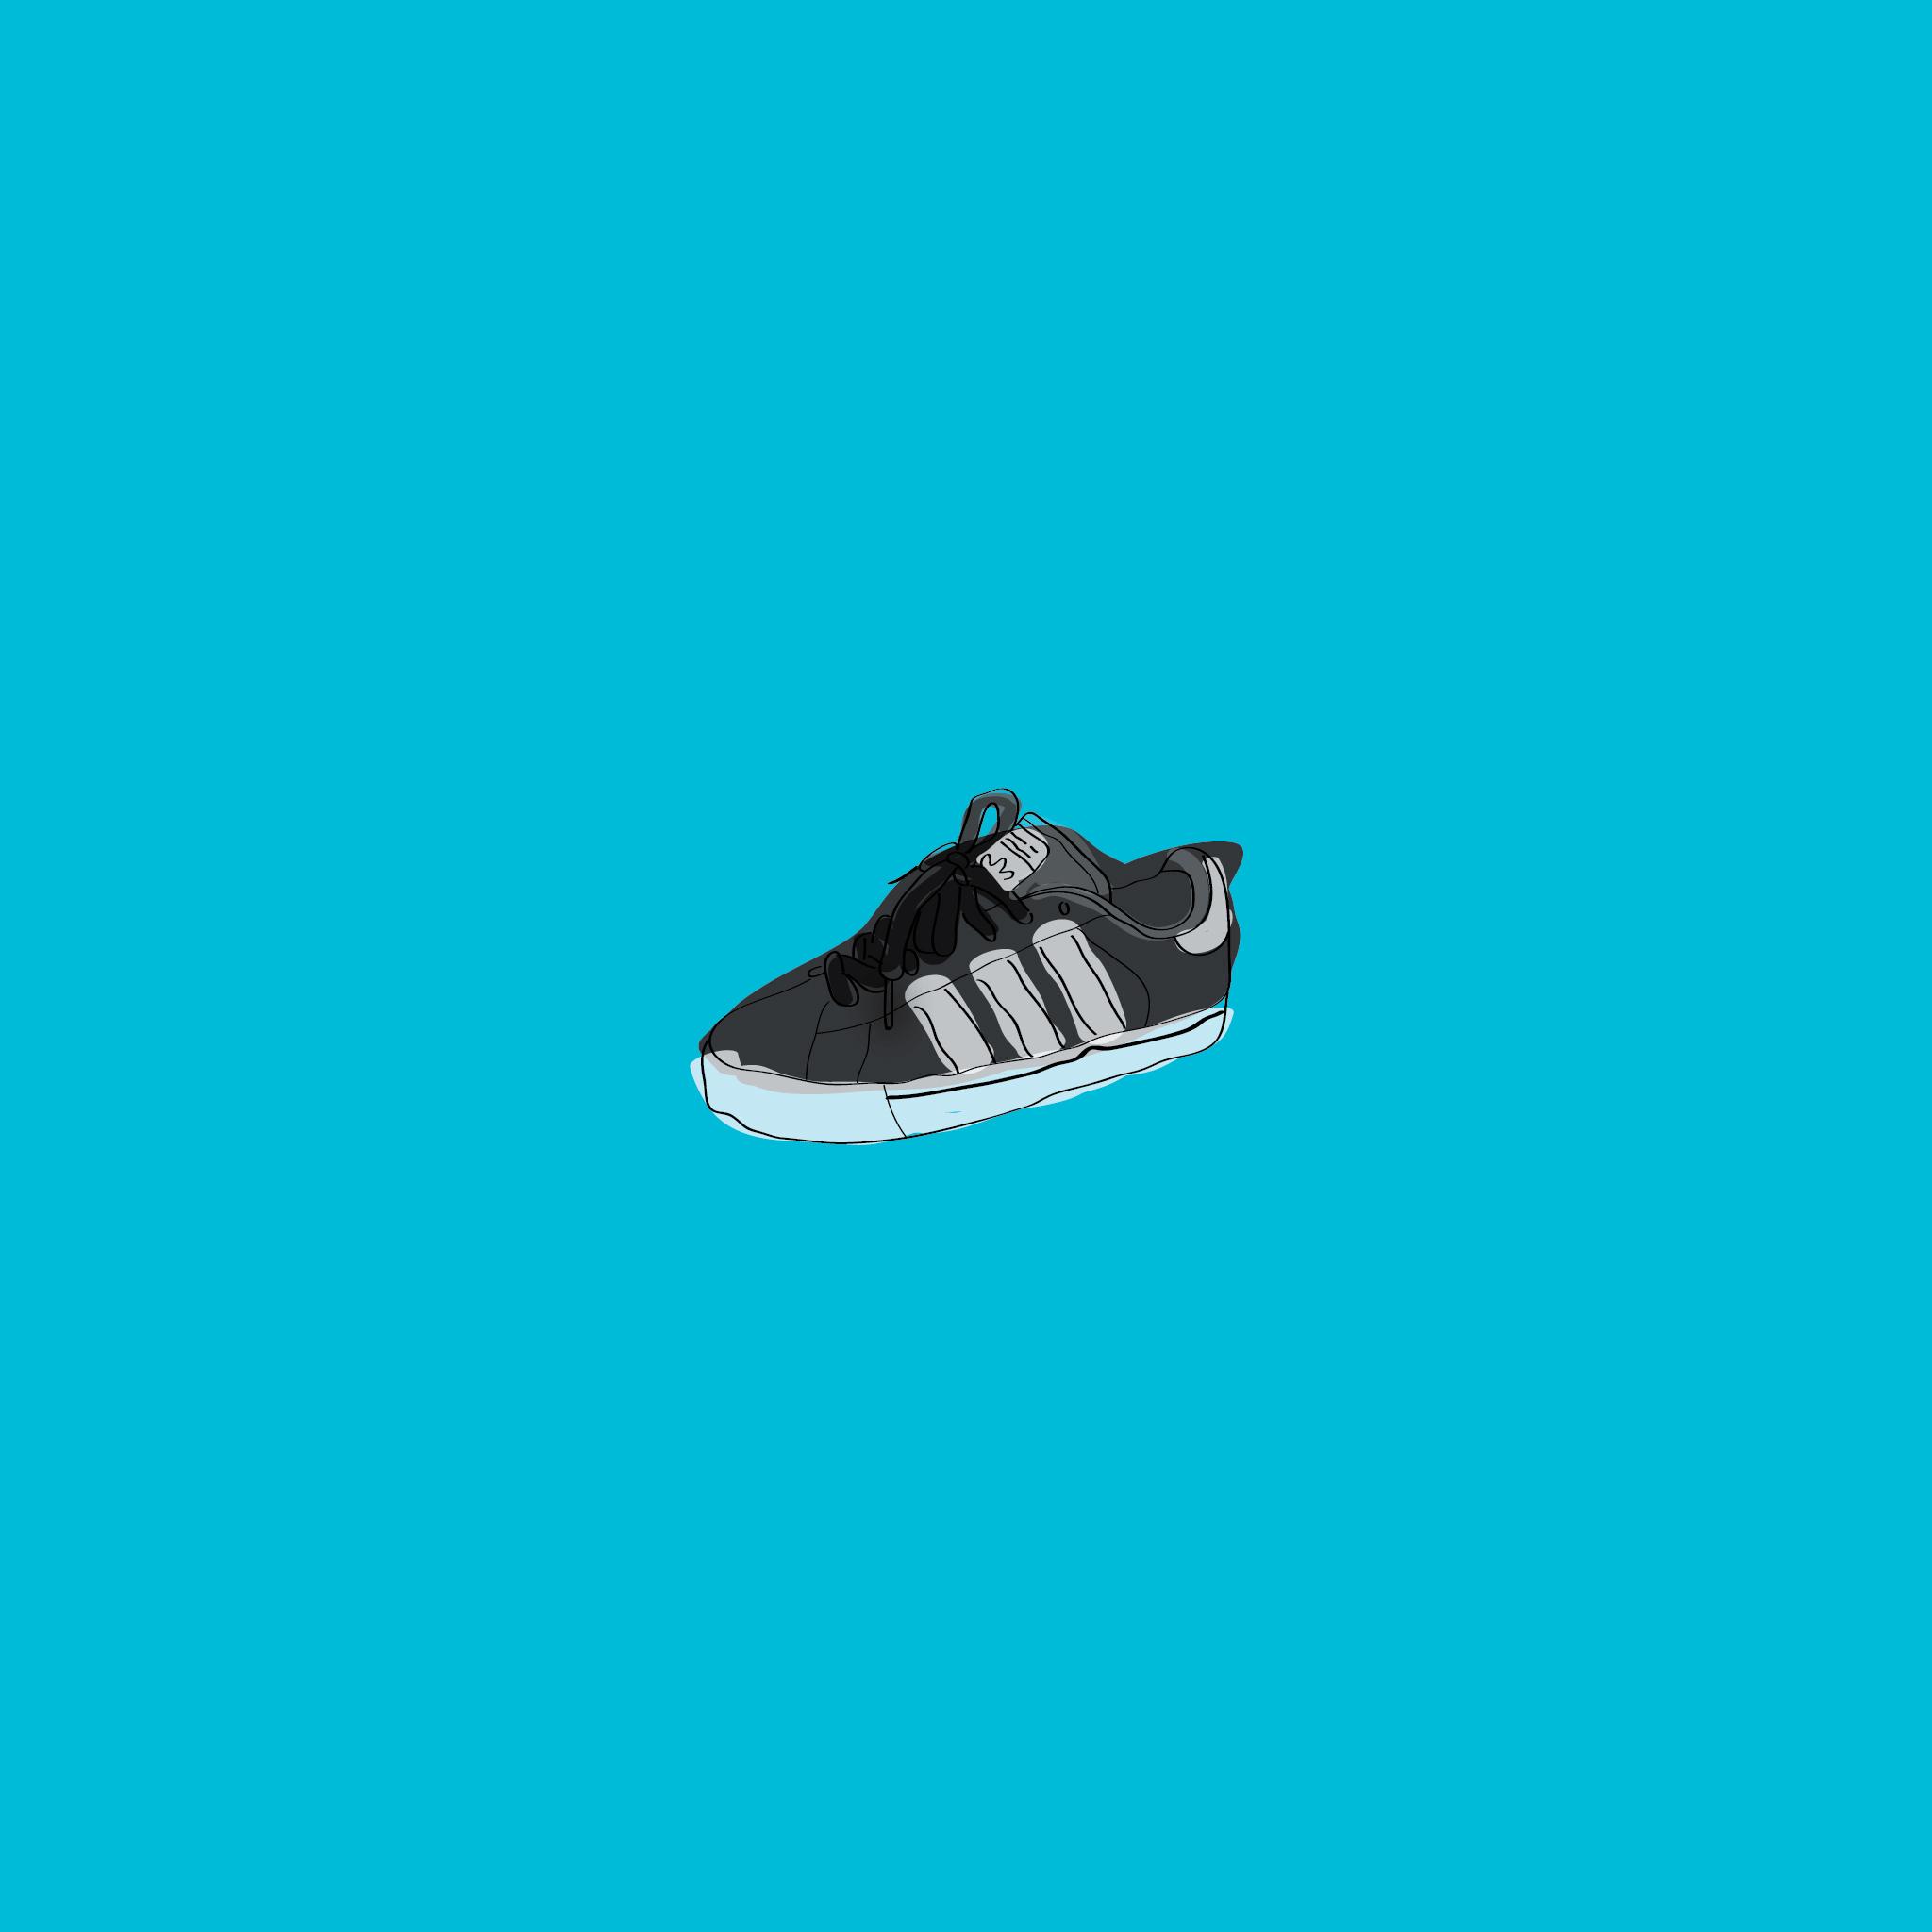 Adidas-3Wallpapers-iPad-Retina